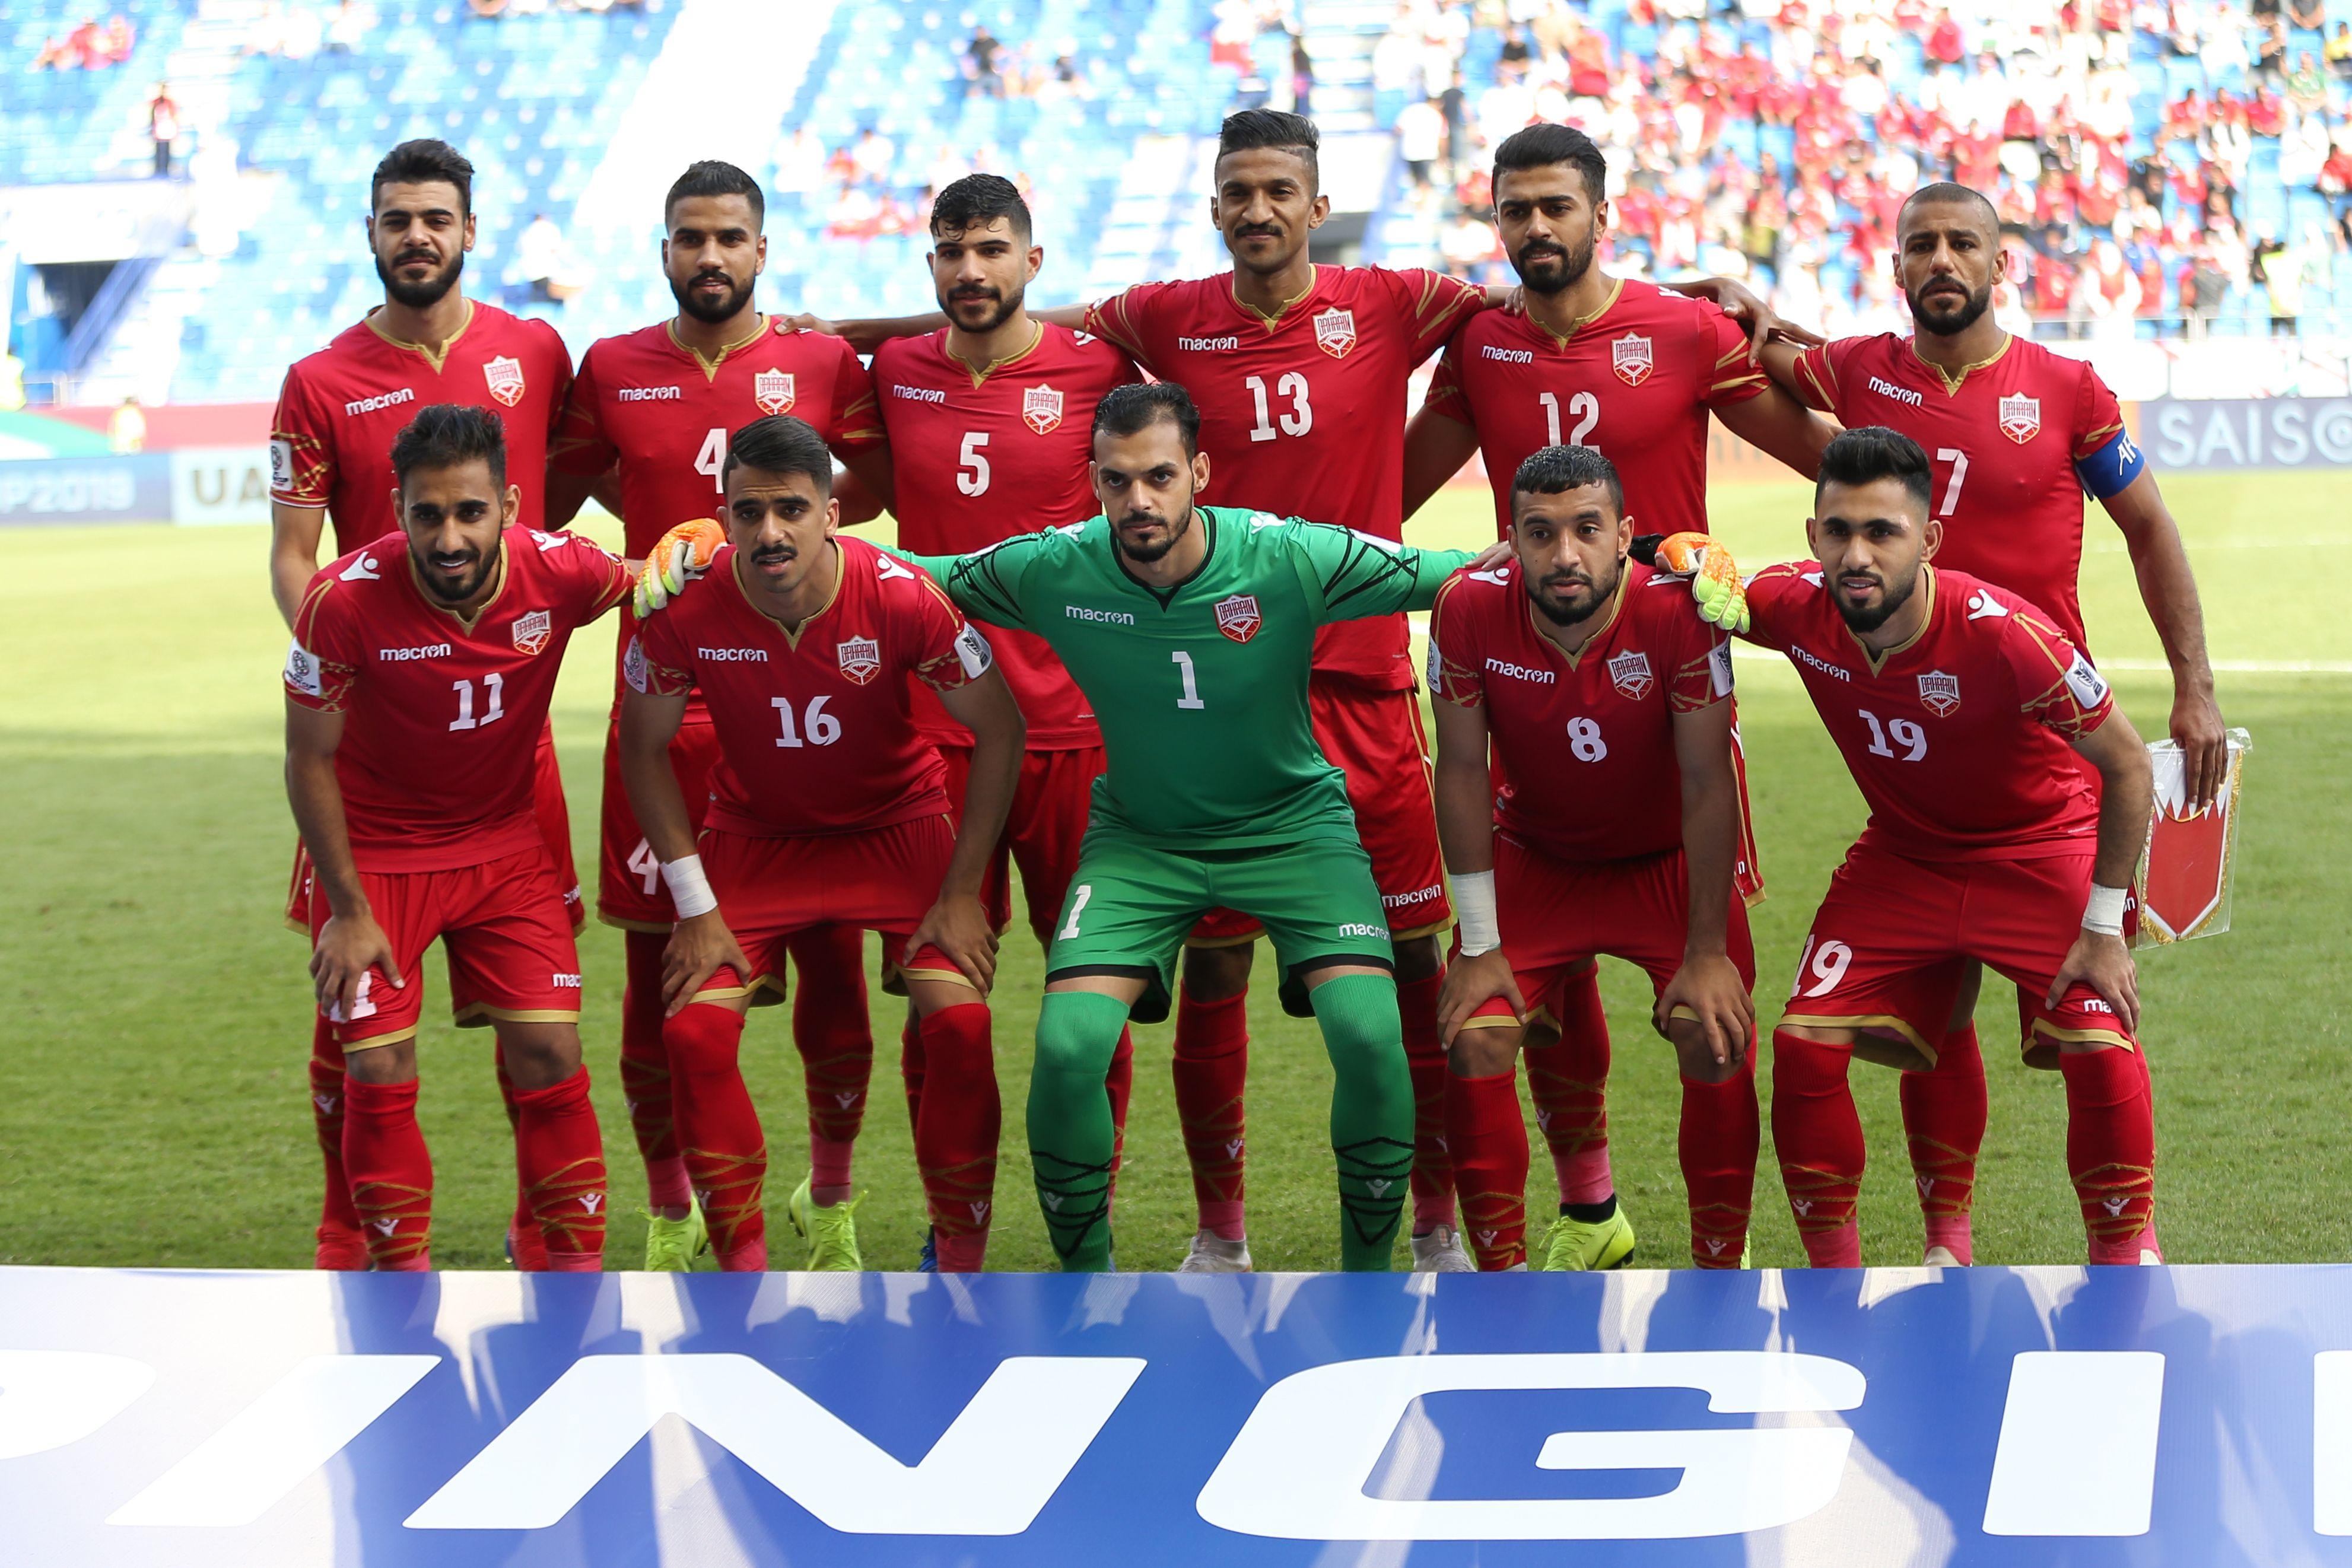 Bahrain Asian Cup 2019